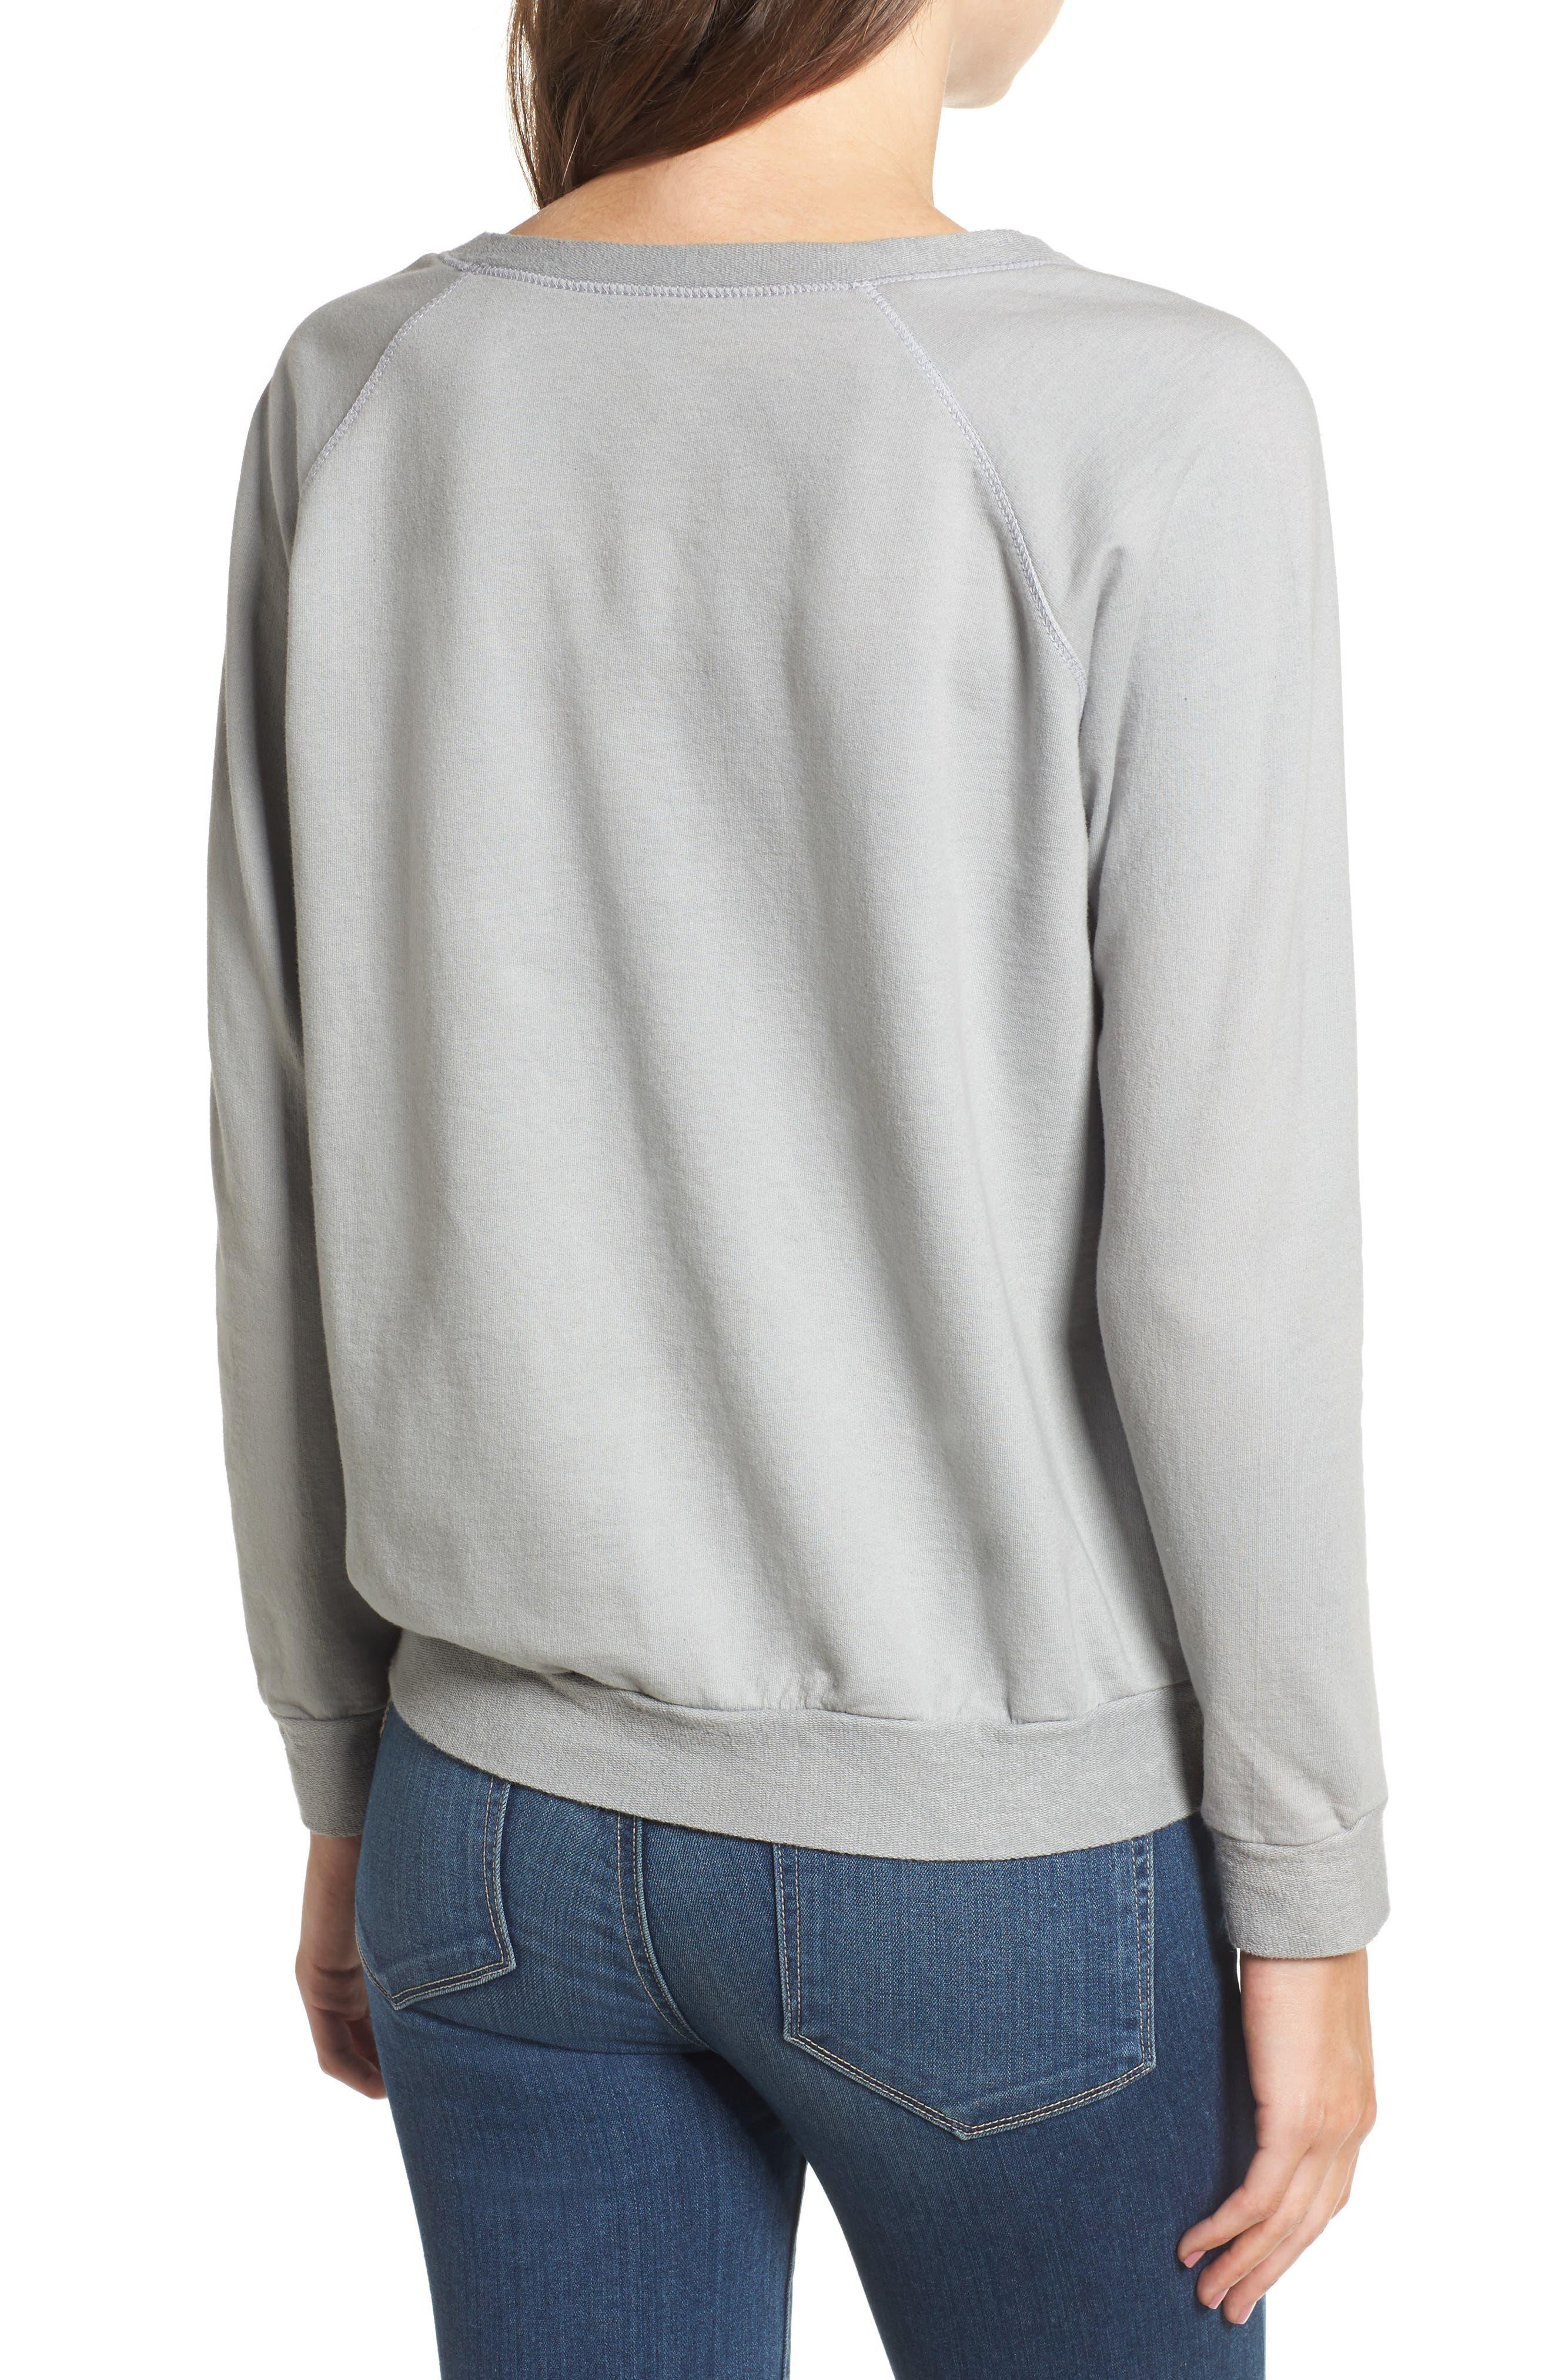 Sleigh Whaaat Sweatshirt,                             Alternate thumbnail 2, color,                             020